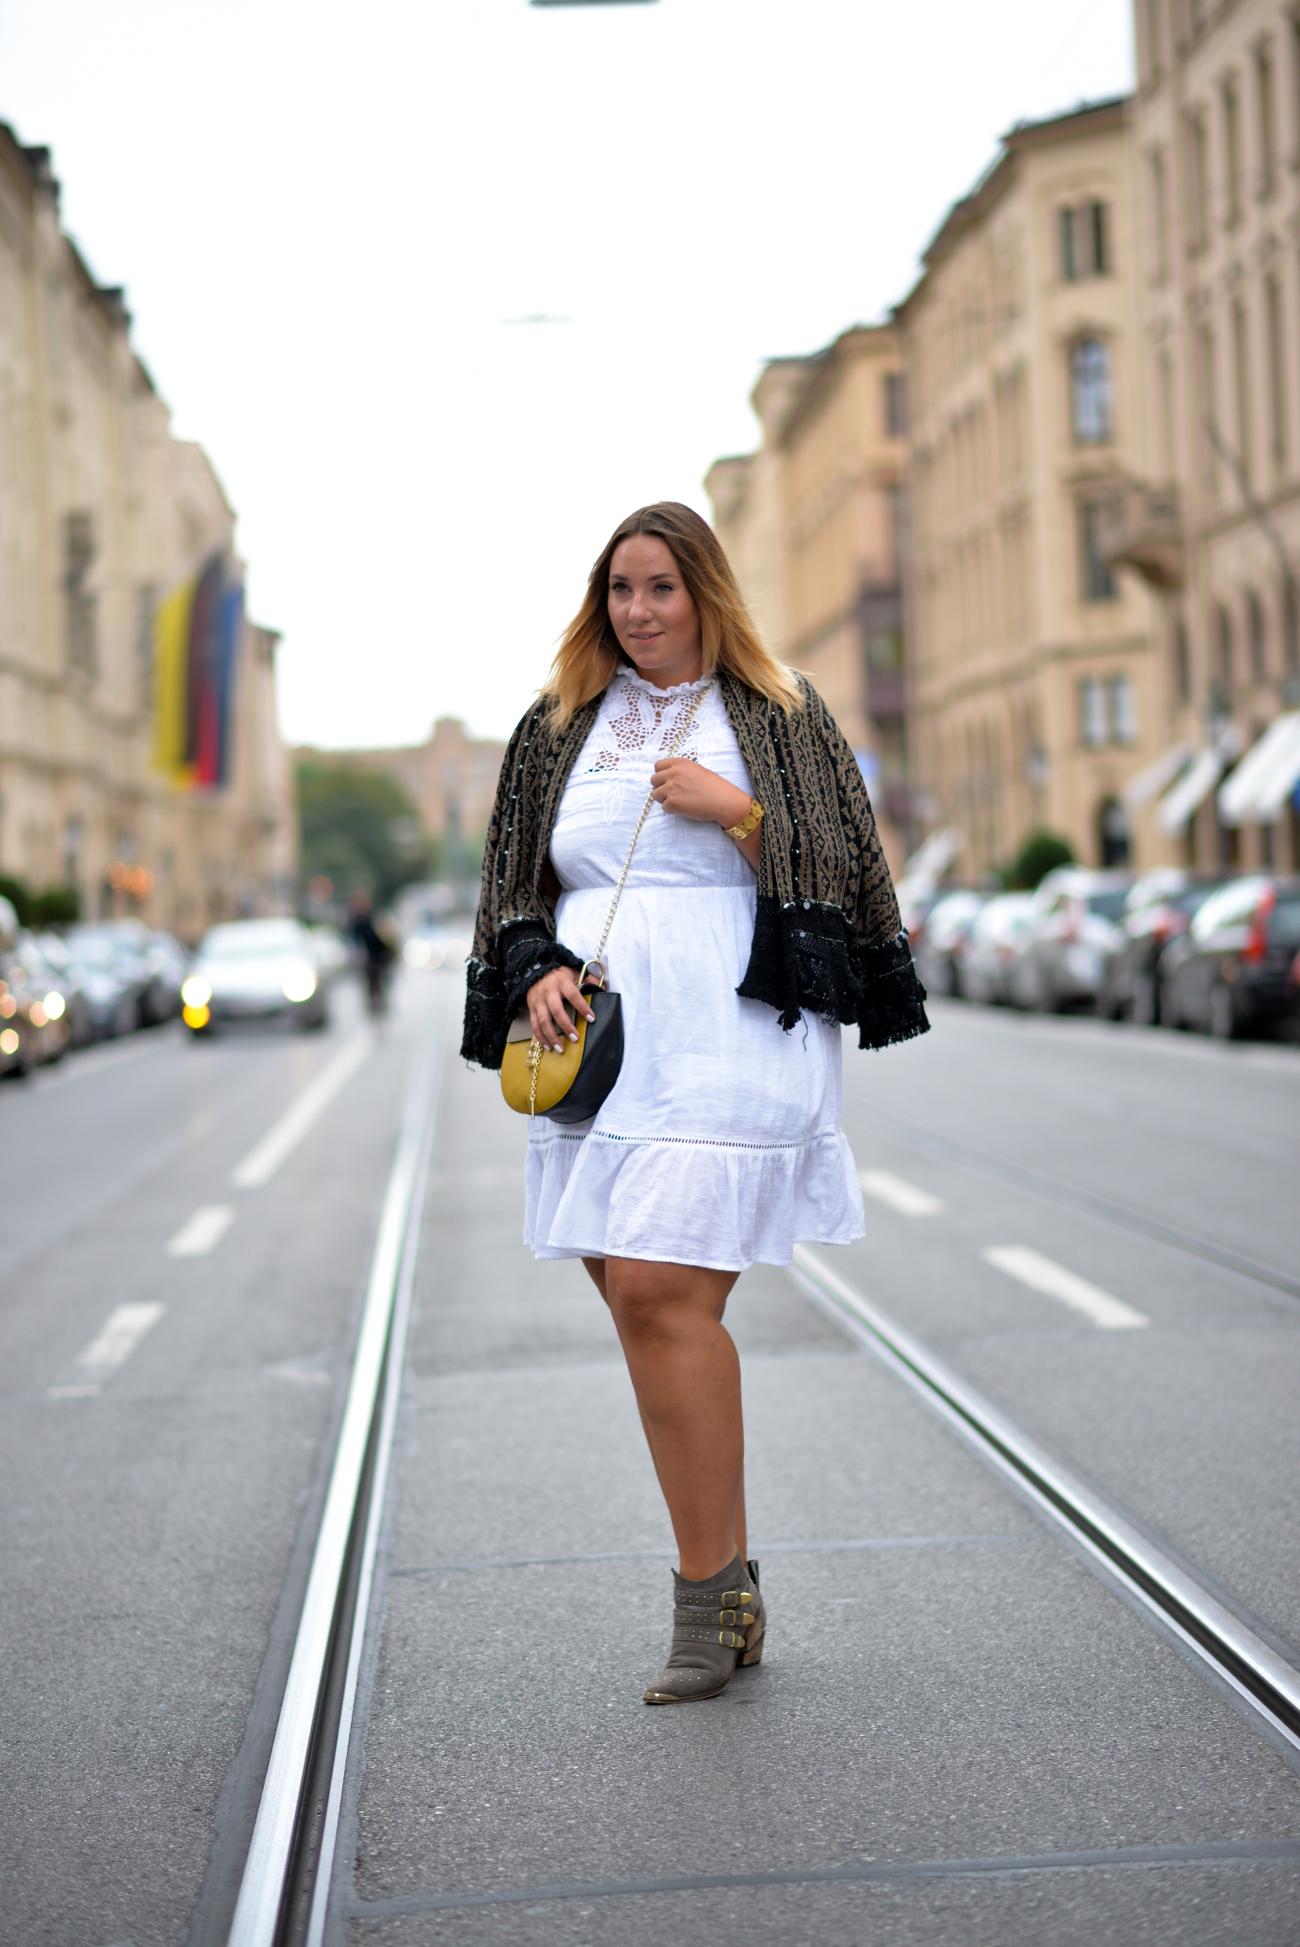 The Skinny and The Curvy One_Plus_Plus Size Blogger_Fashion_Blogger Deutschland_Fashionblogger Munich_Curve (1 von 17)